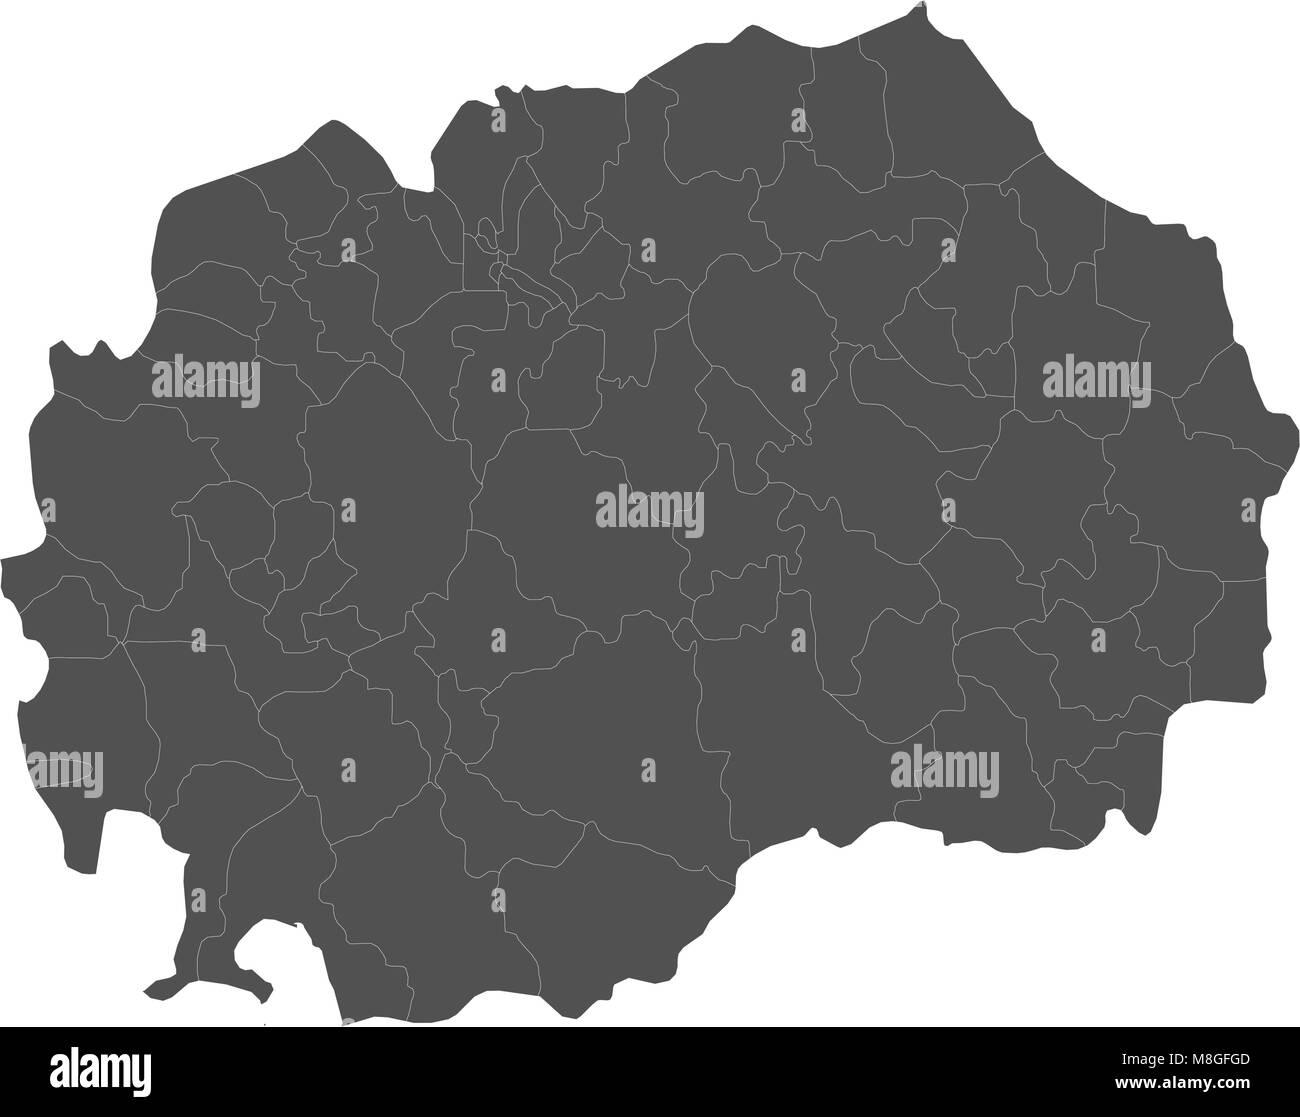 Map of republic of macedonia split into regions stock vector art map of republic of macedonia split into regions publicscrutiny Gallery